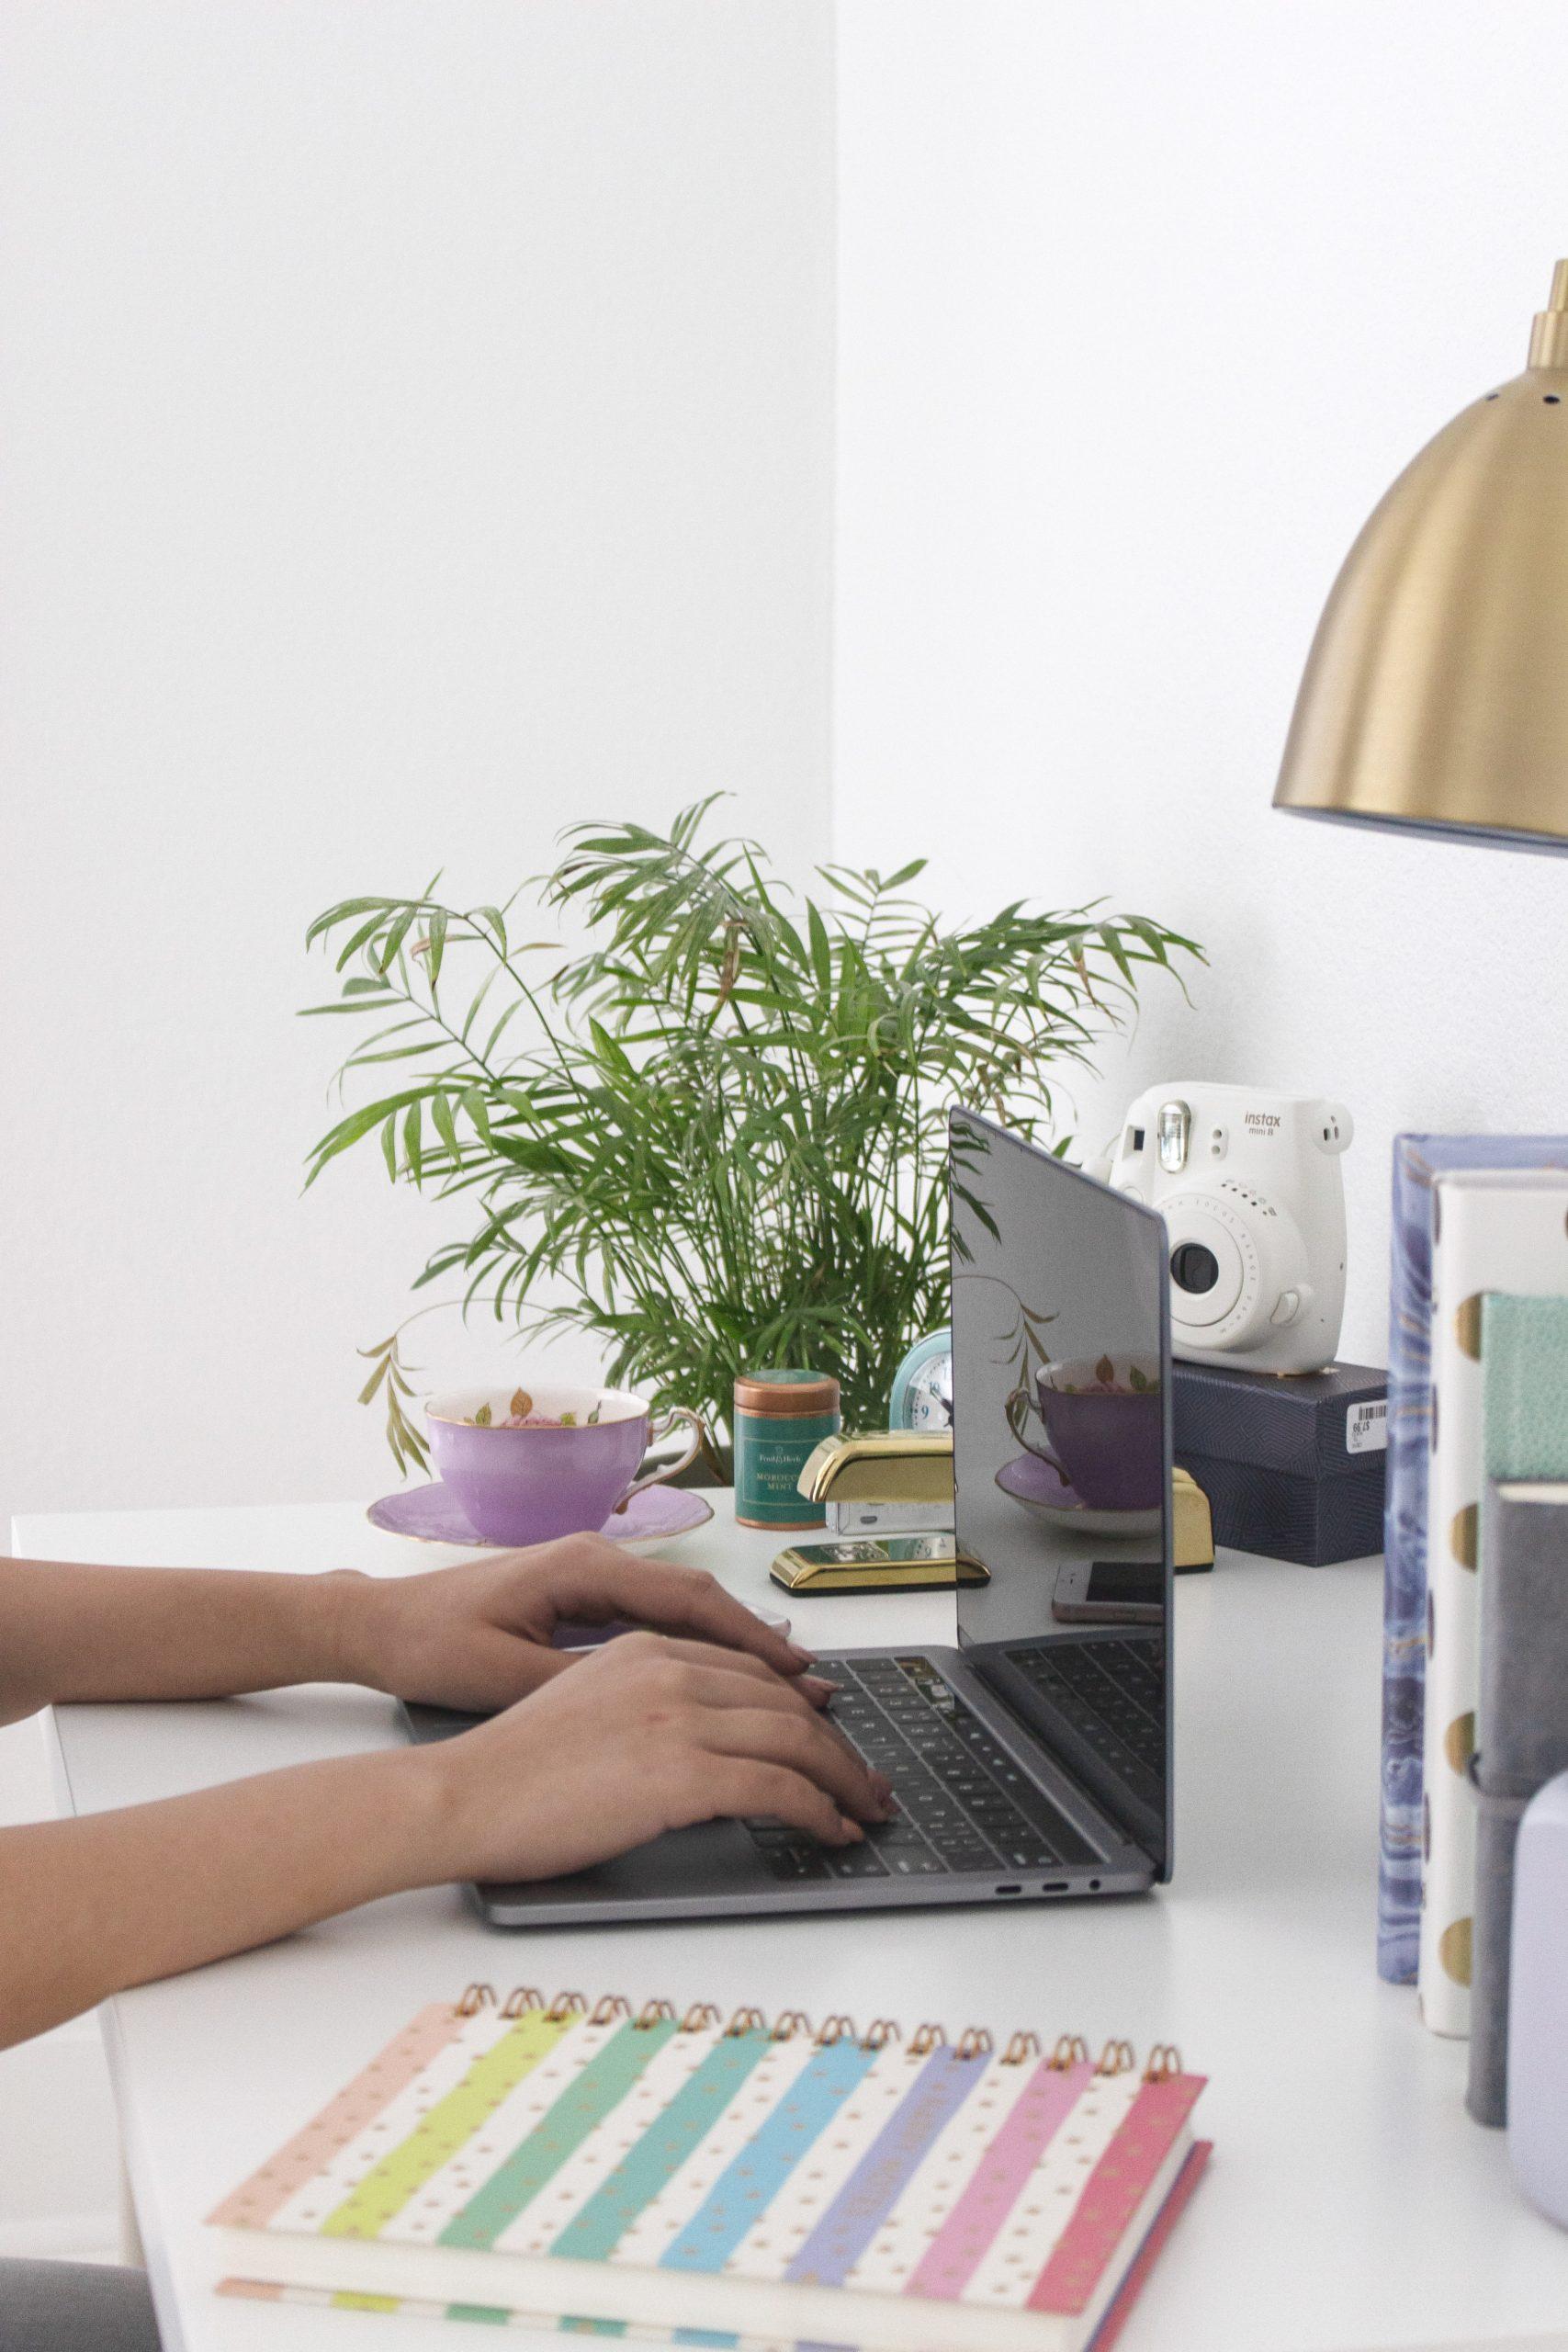 Typing at computer indicating hard work